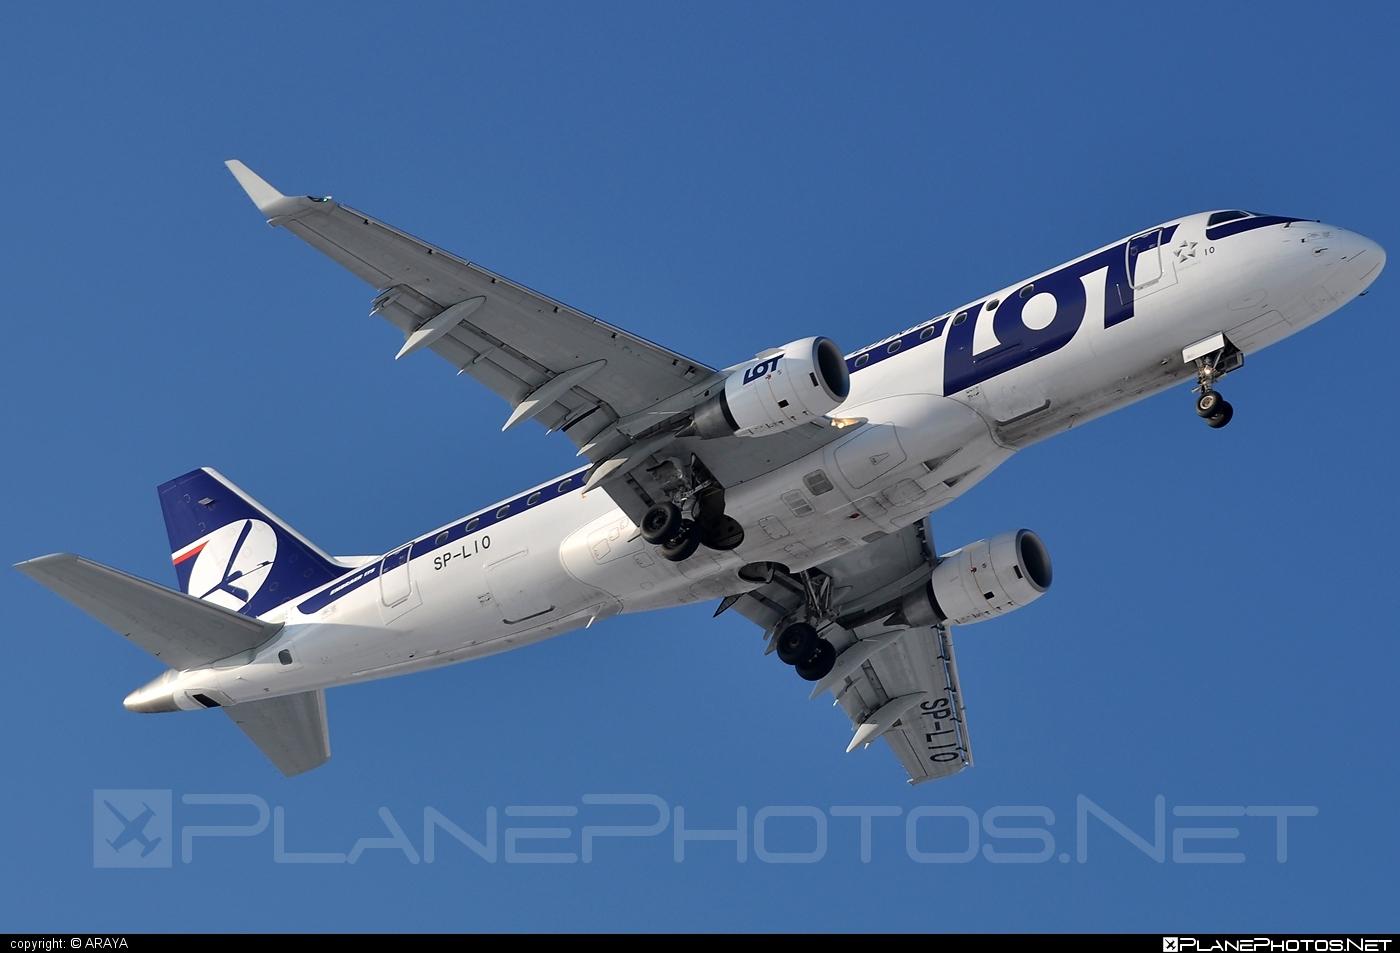 Embraer E175LR (ERJ-170-200LR) - SP-LIO operated by LOT Polish Airlines #e175 #embraer #embraer175 #embraer175lr #erj170200 #erj170200lr #erj175 #erj175lr #lot #lotpolishairlines